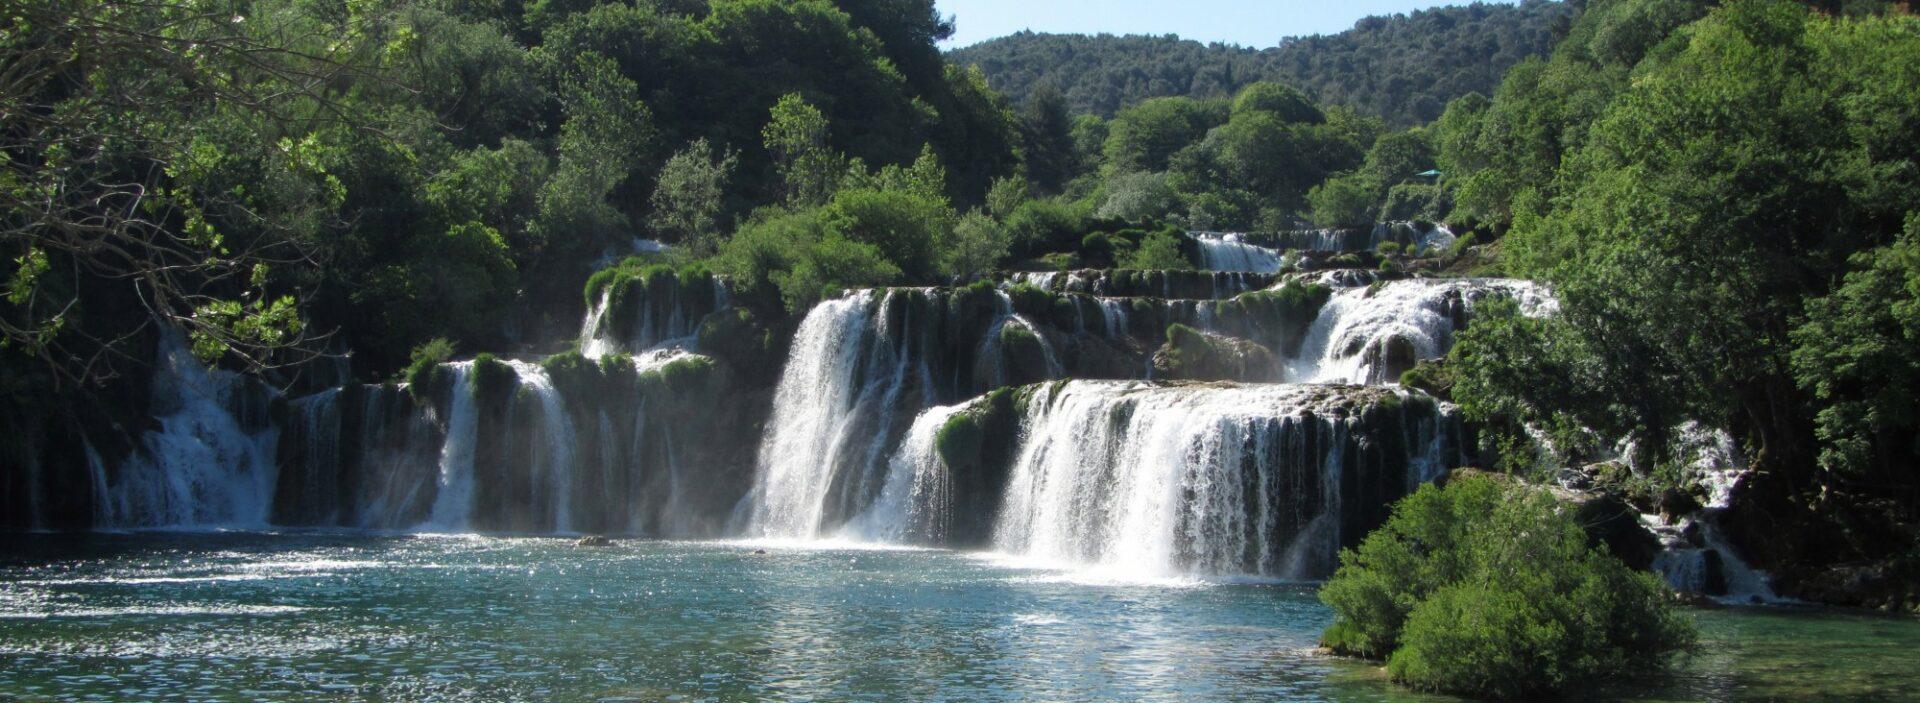 Croacia Parques Nacionales